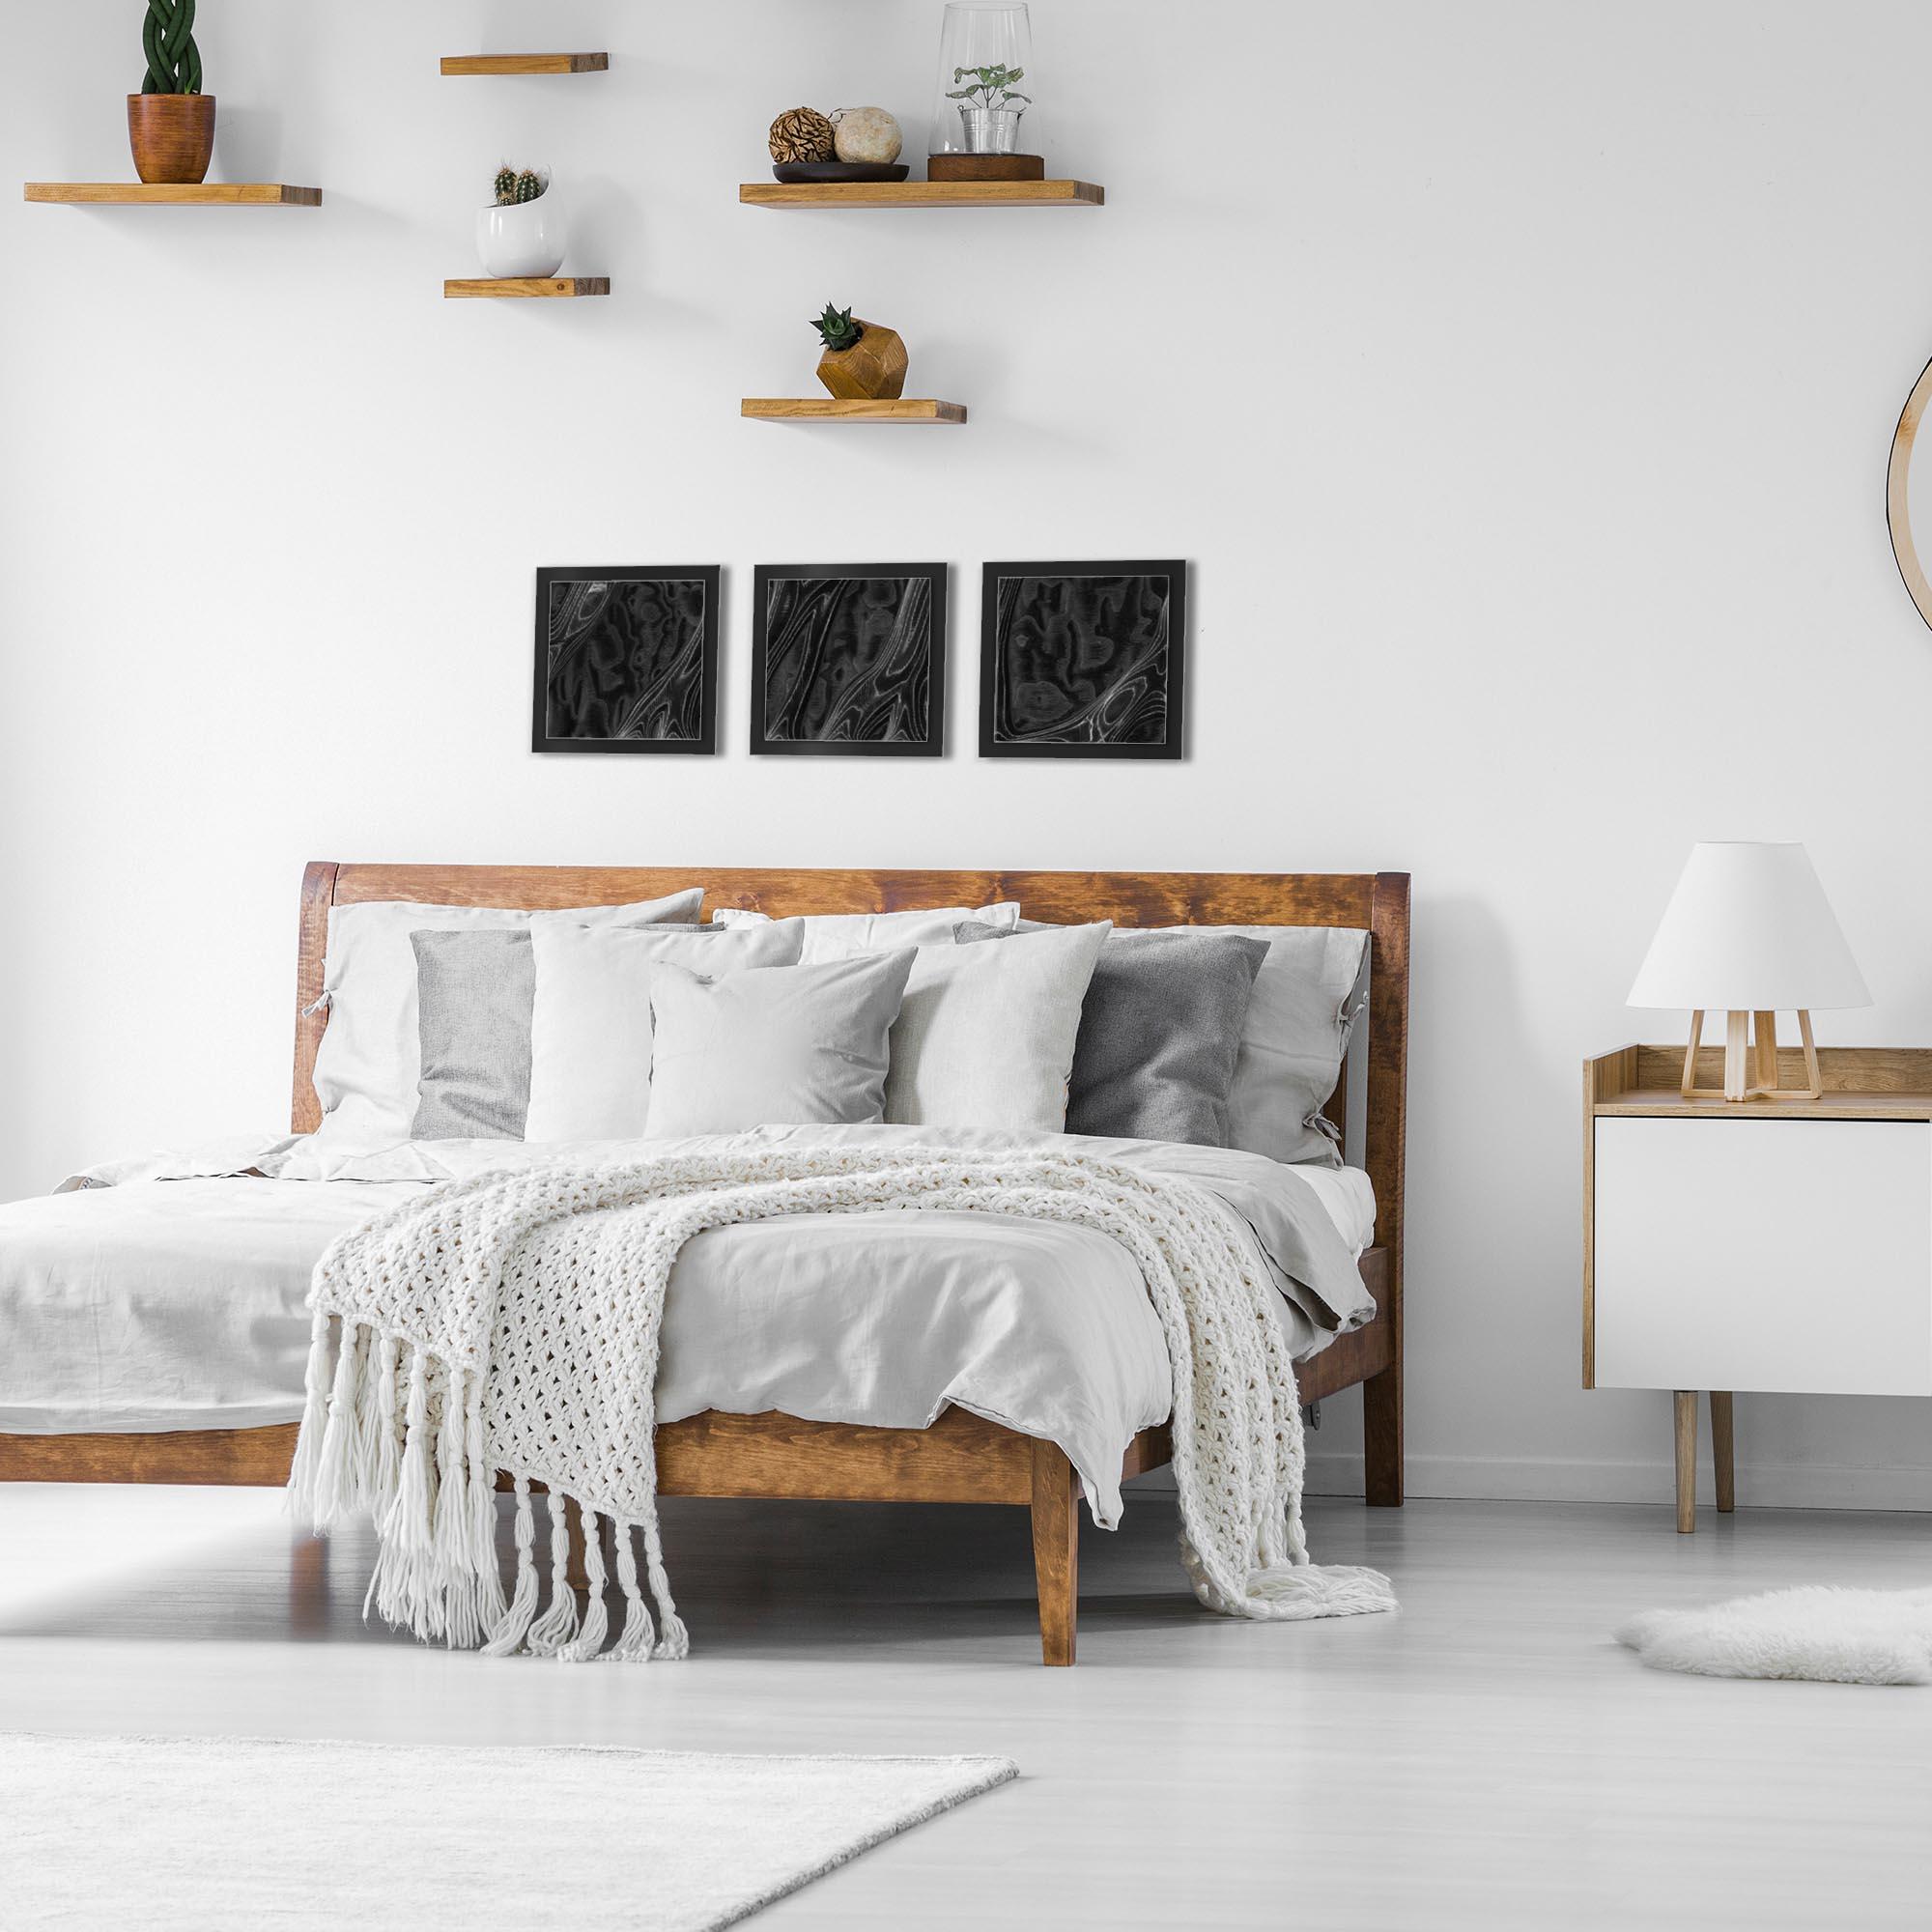 Ebony Burl Essence Black by Jackson Wright Rustic Modern Style Wood Wall Art - Lifestyle View